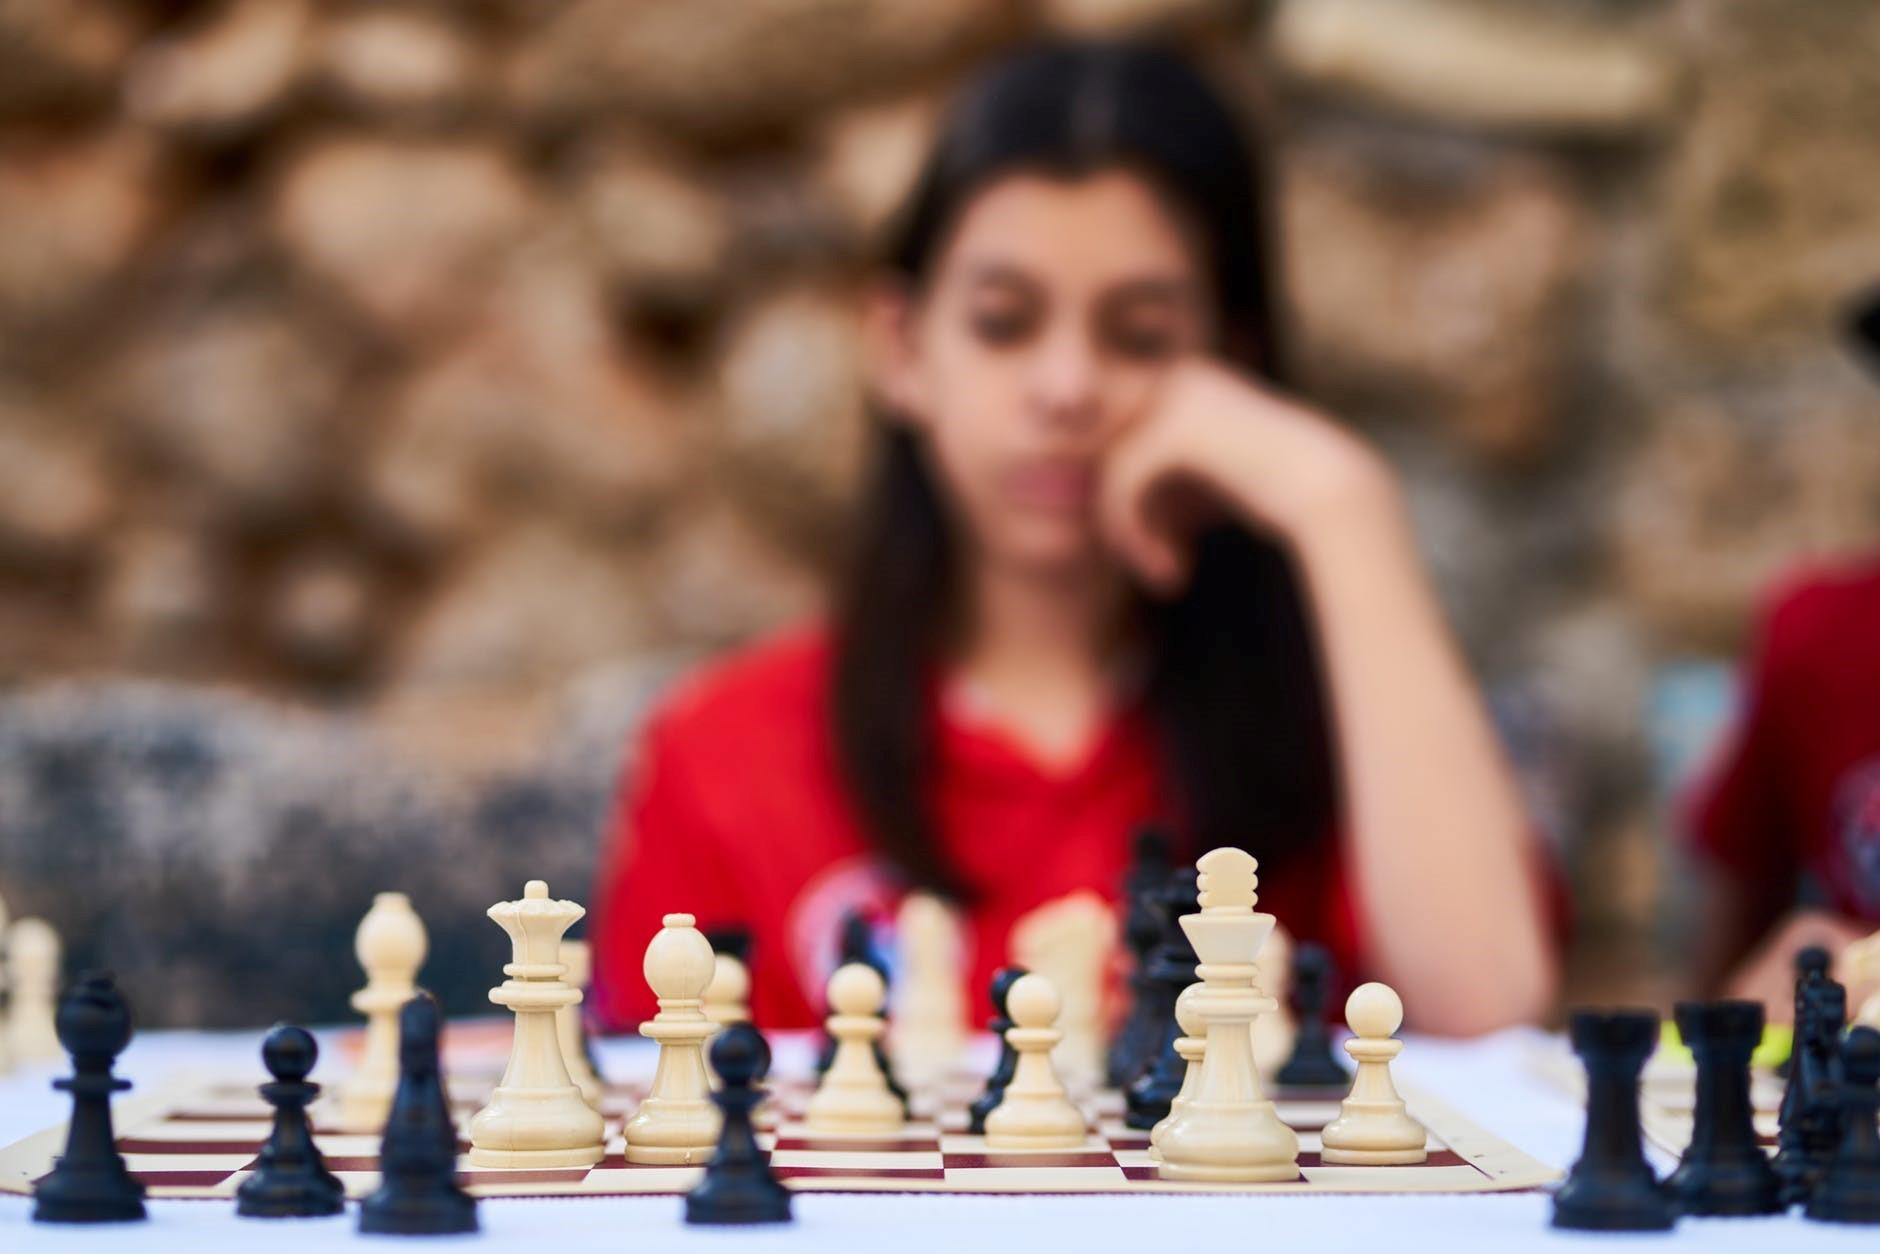 Как развитие морали связано с игрой в шахматы